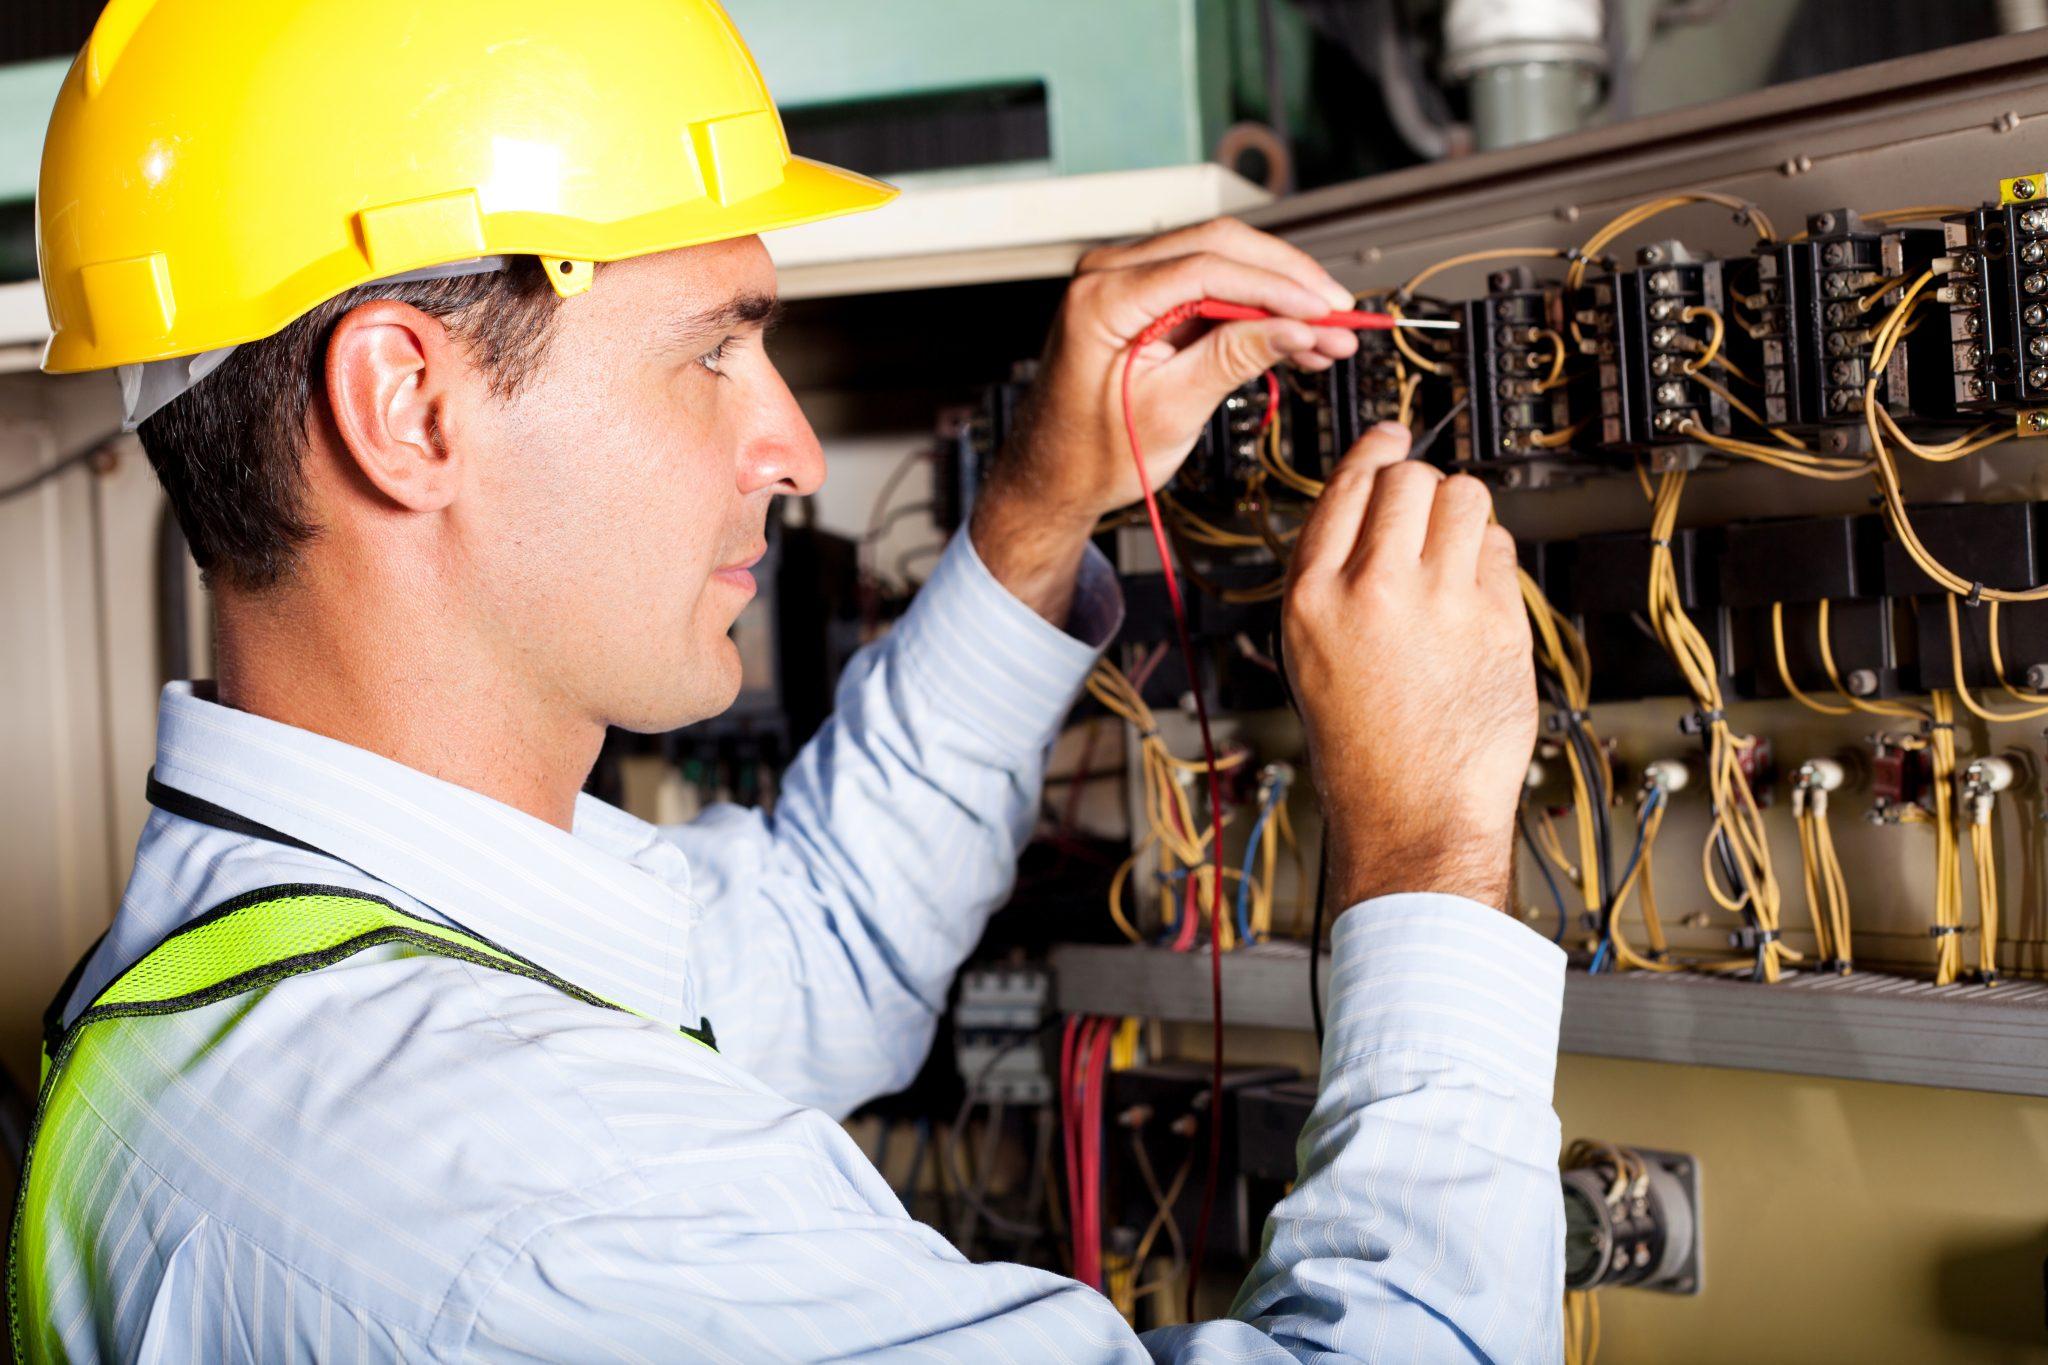 kelowna-electrician-epic-electric-electrician-working-on-circuit-board-1